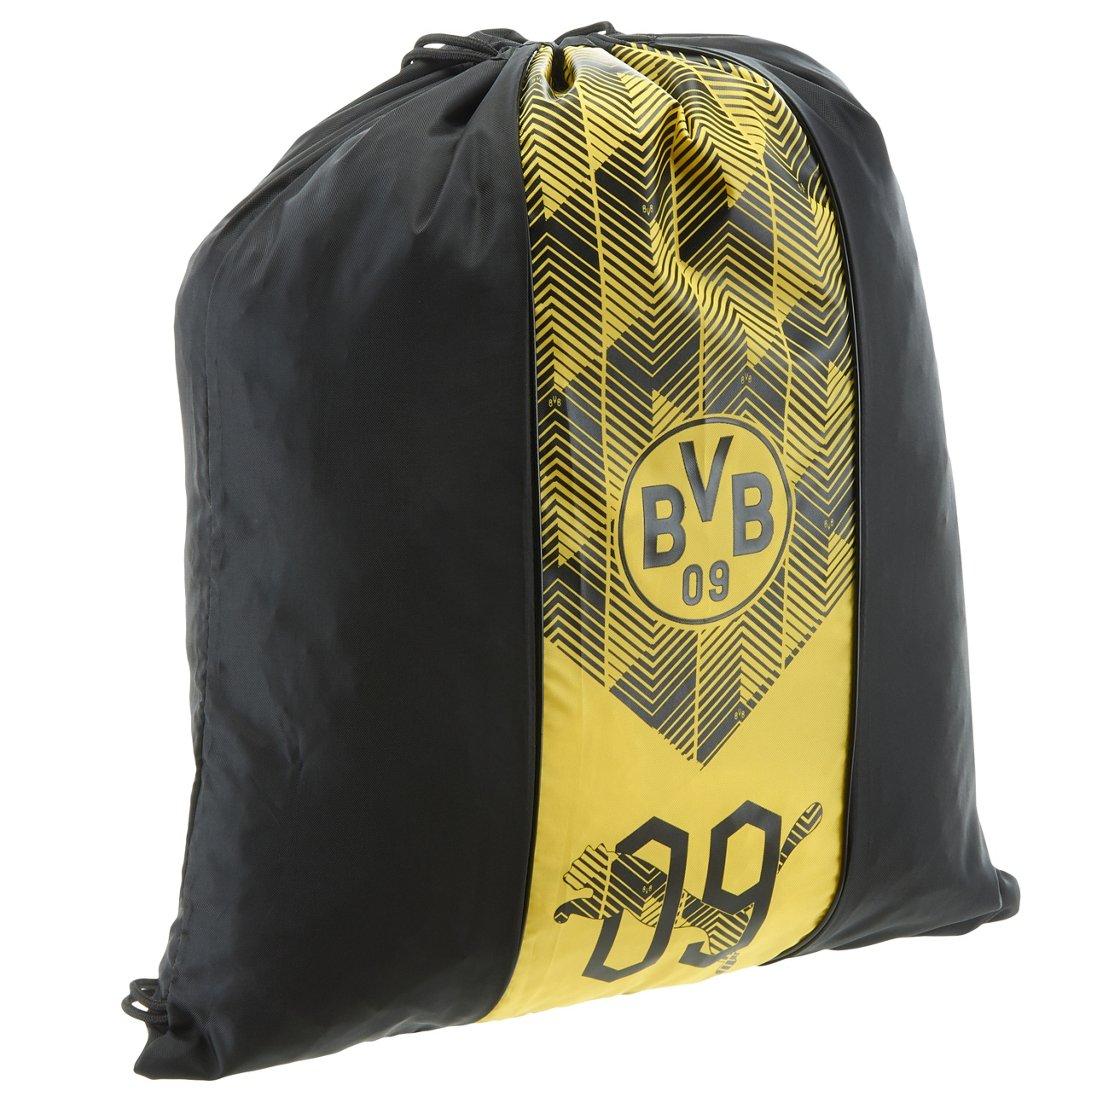 d2ee163465b82 Puma BVB Fan Gym Sack Sportbeutel 47 cm - black-cyber yellow